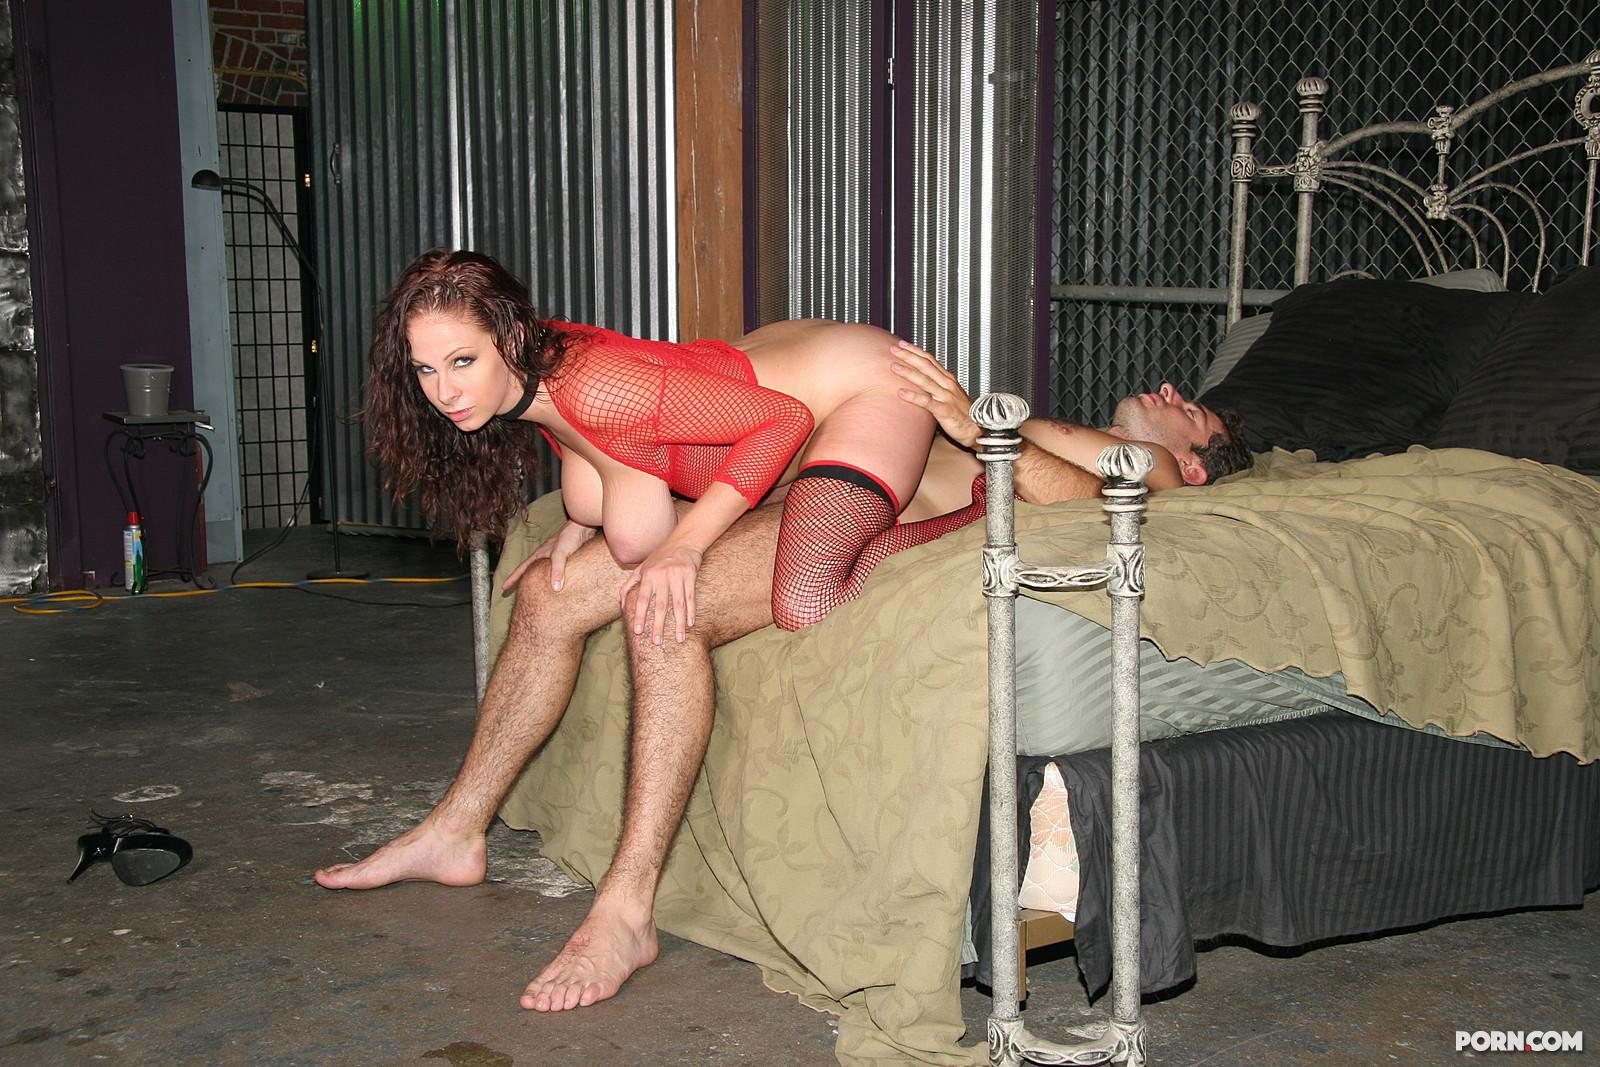 Рабыни ублажают хозяина порно онлайн 11 фотография